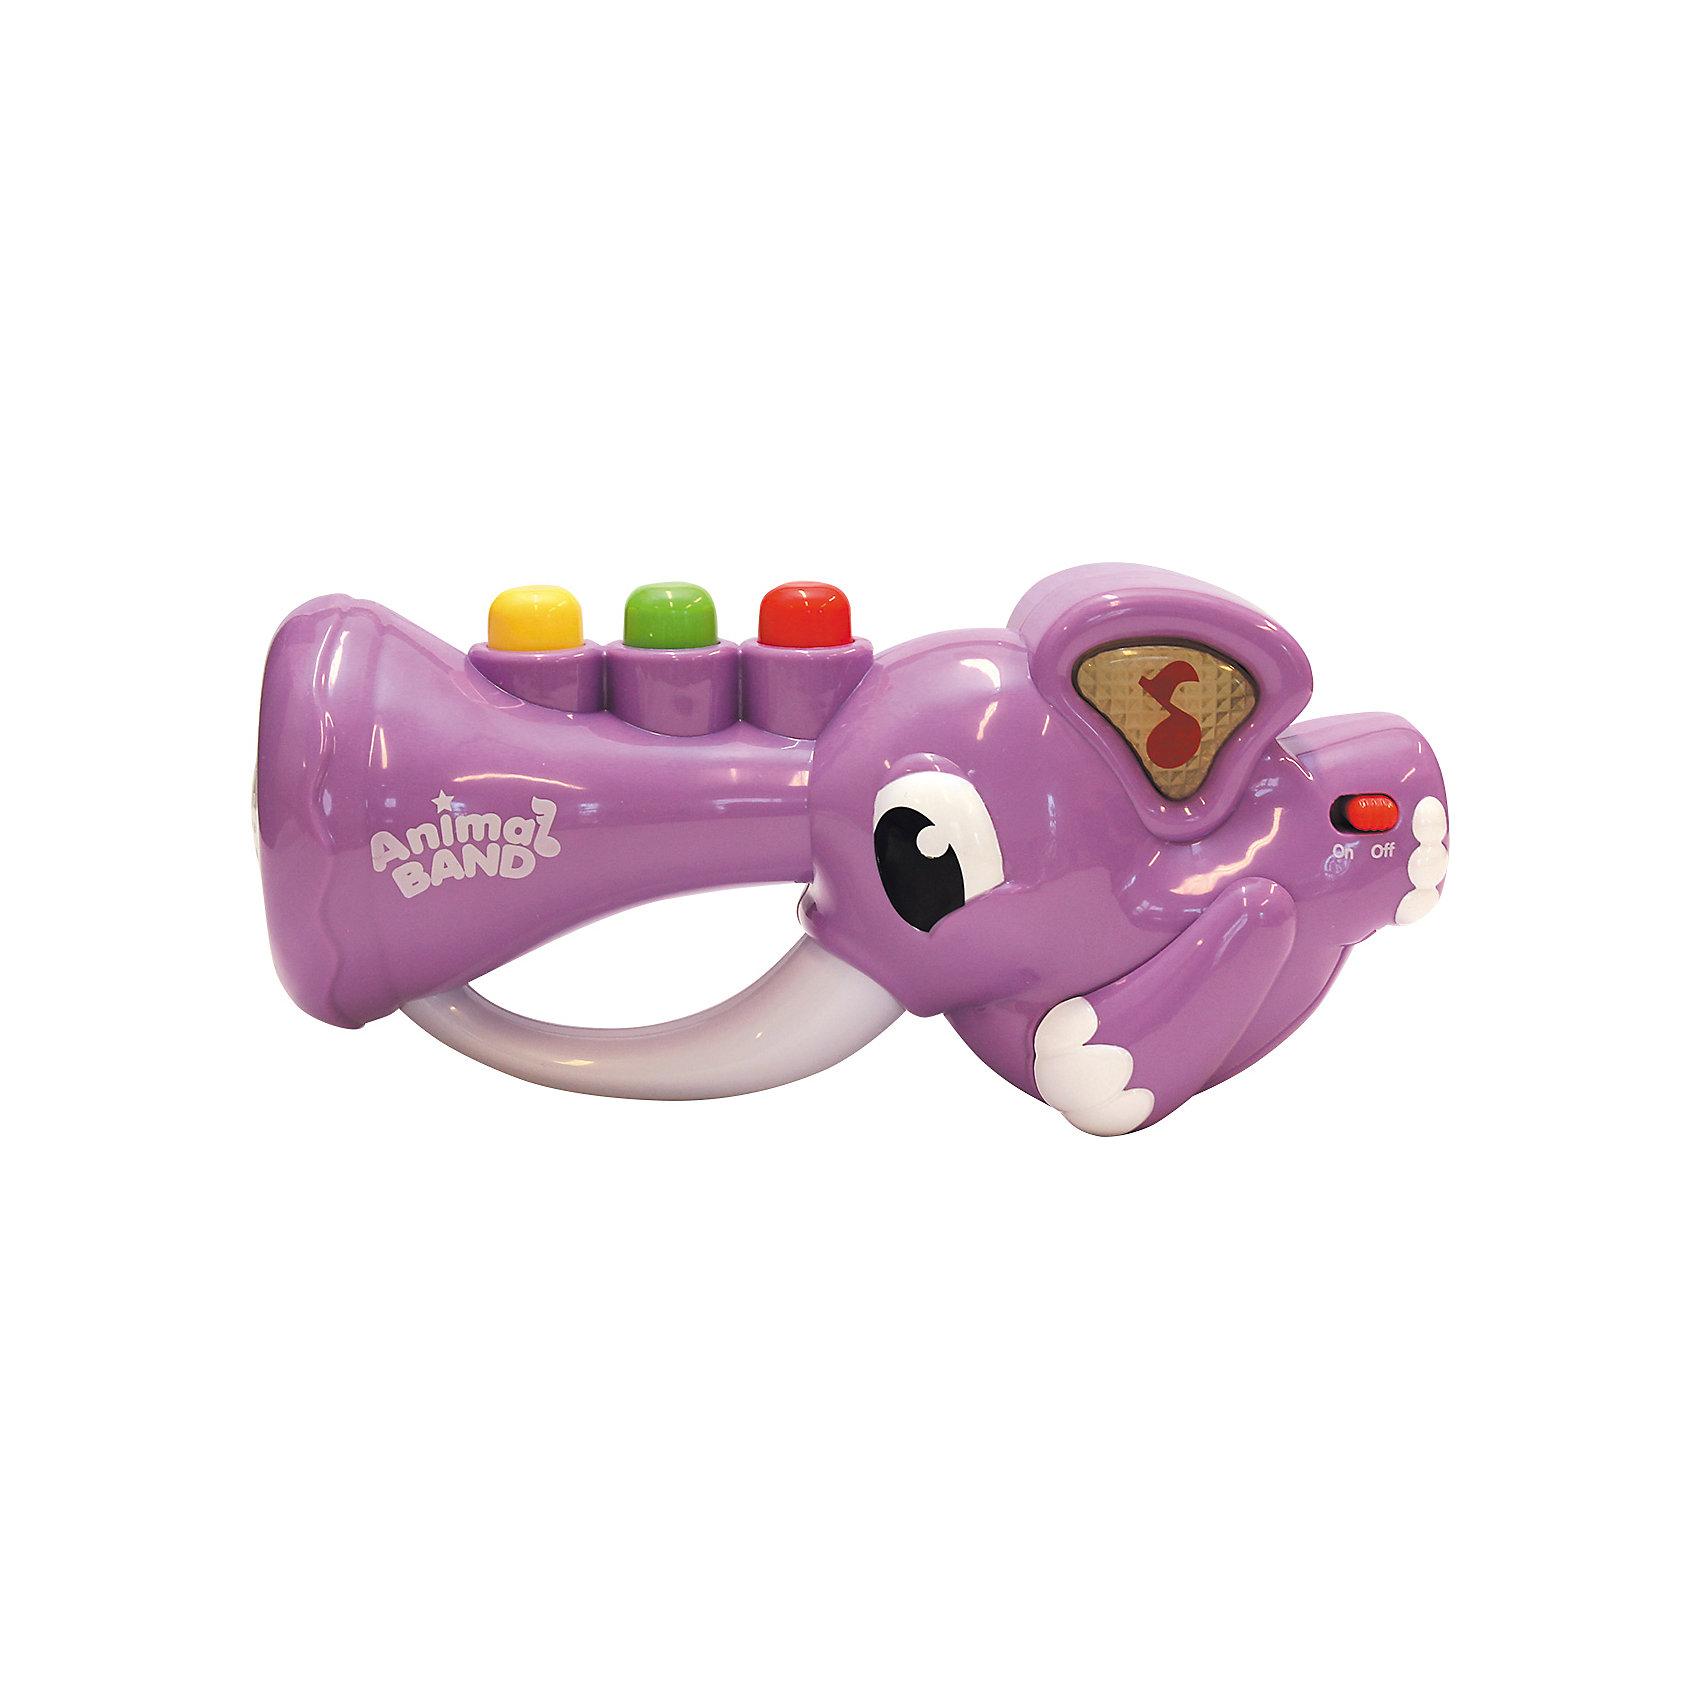 Keenway Слоник-трубач, Keenway игрушка музыкальная развивающая игрушка keenway игровой набор оркестр